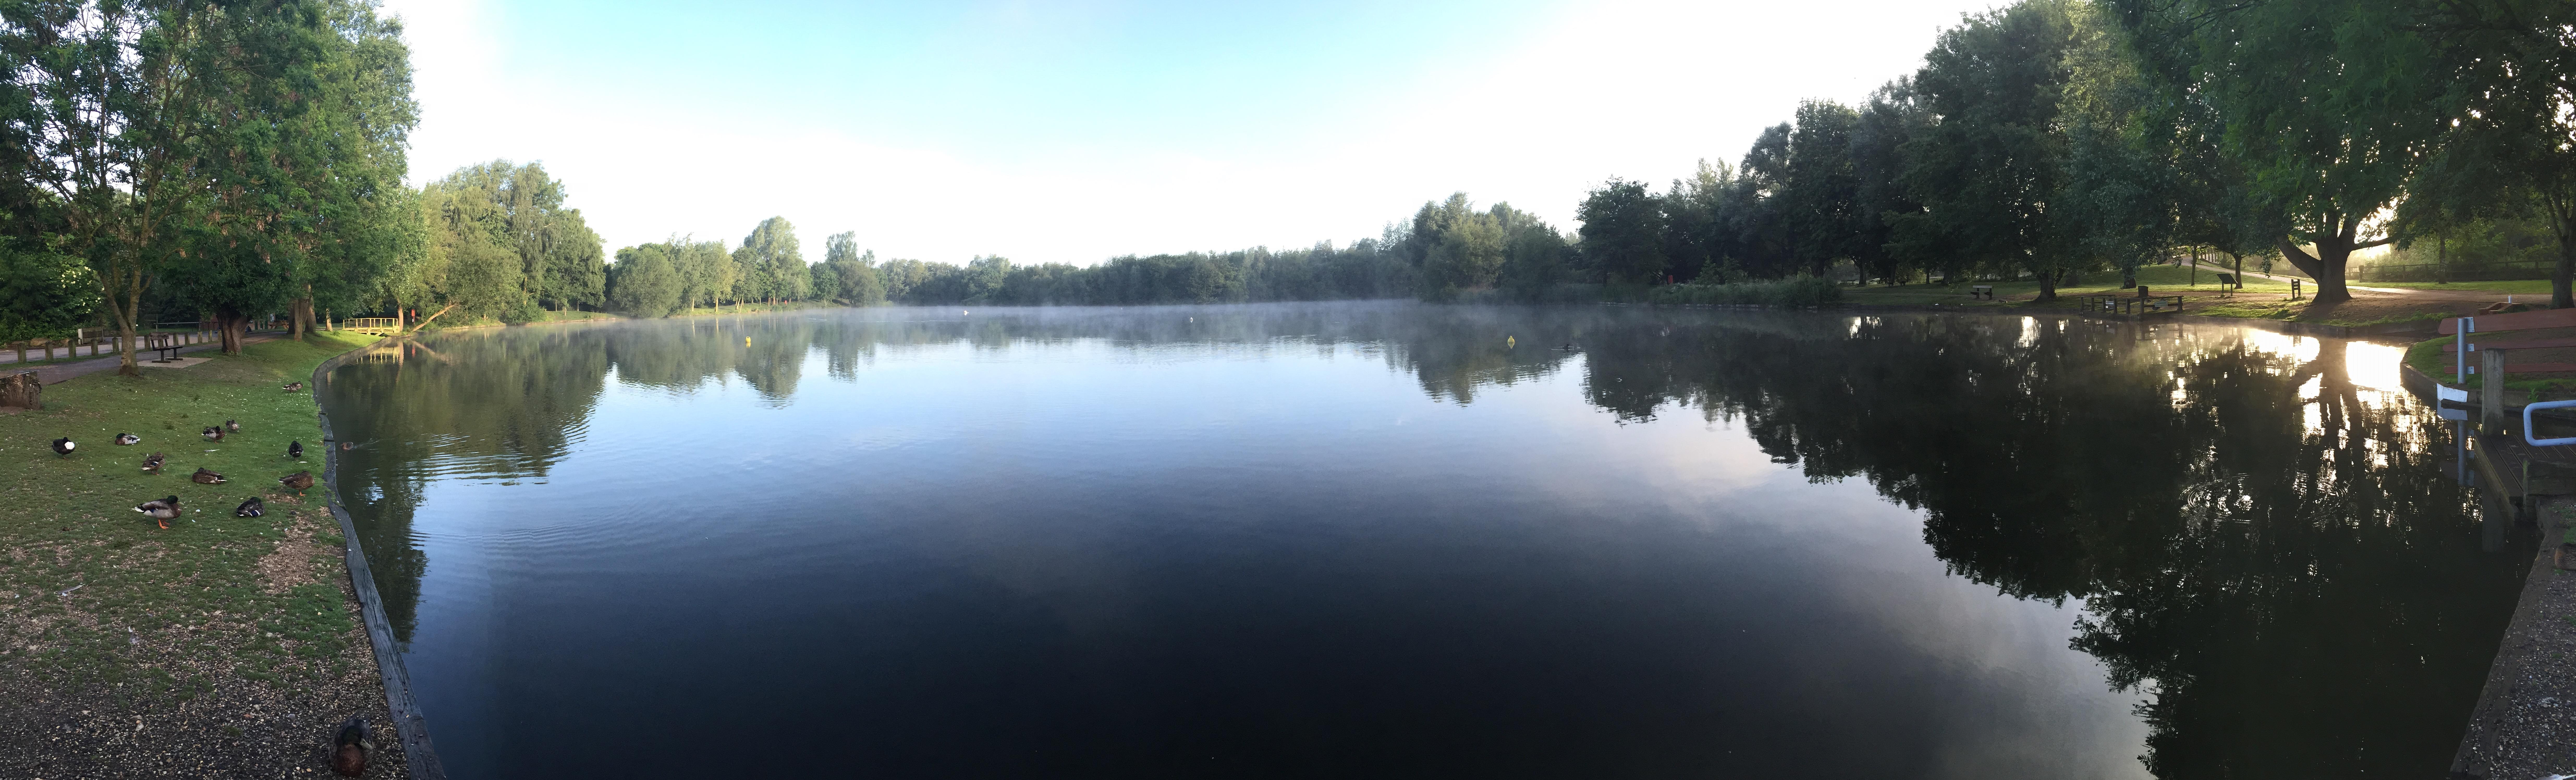 Needham Lake in the Heart of Suffolk